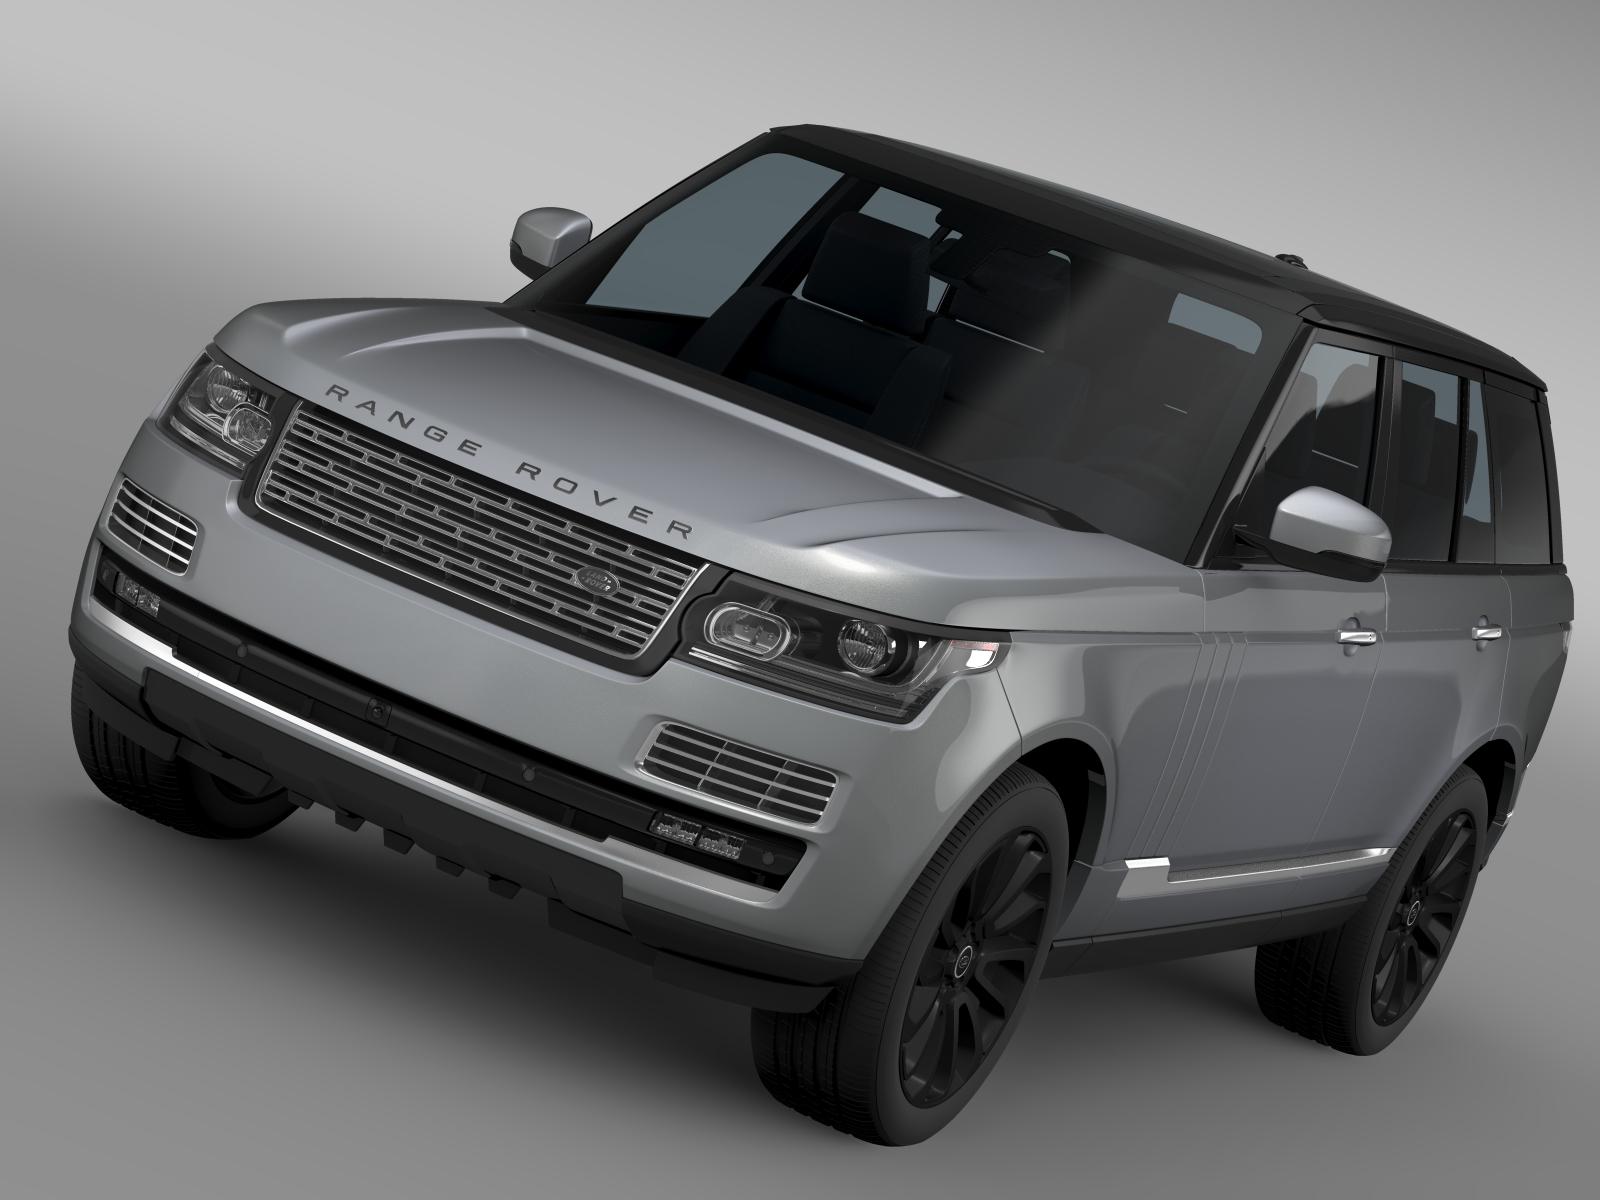 range rover svautobiography l405 2016 v1 3d model 3ds max fbx c4d lwo ma mb hrc xsi obj 215966